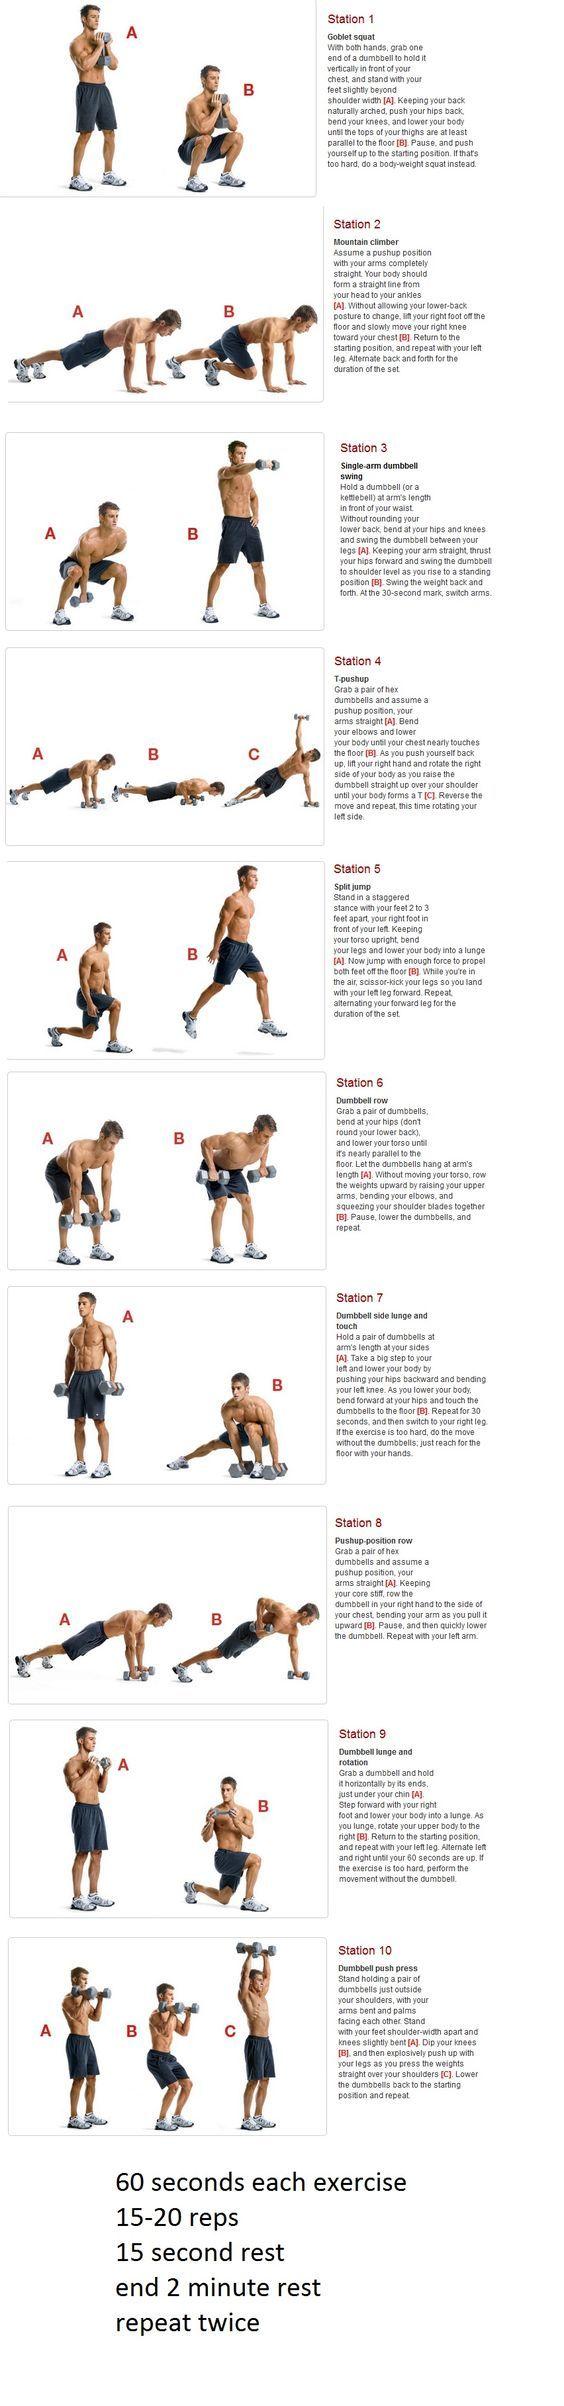 Spartacus Workout